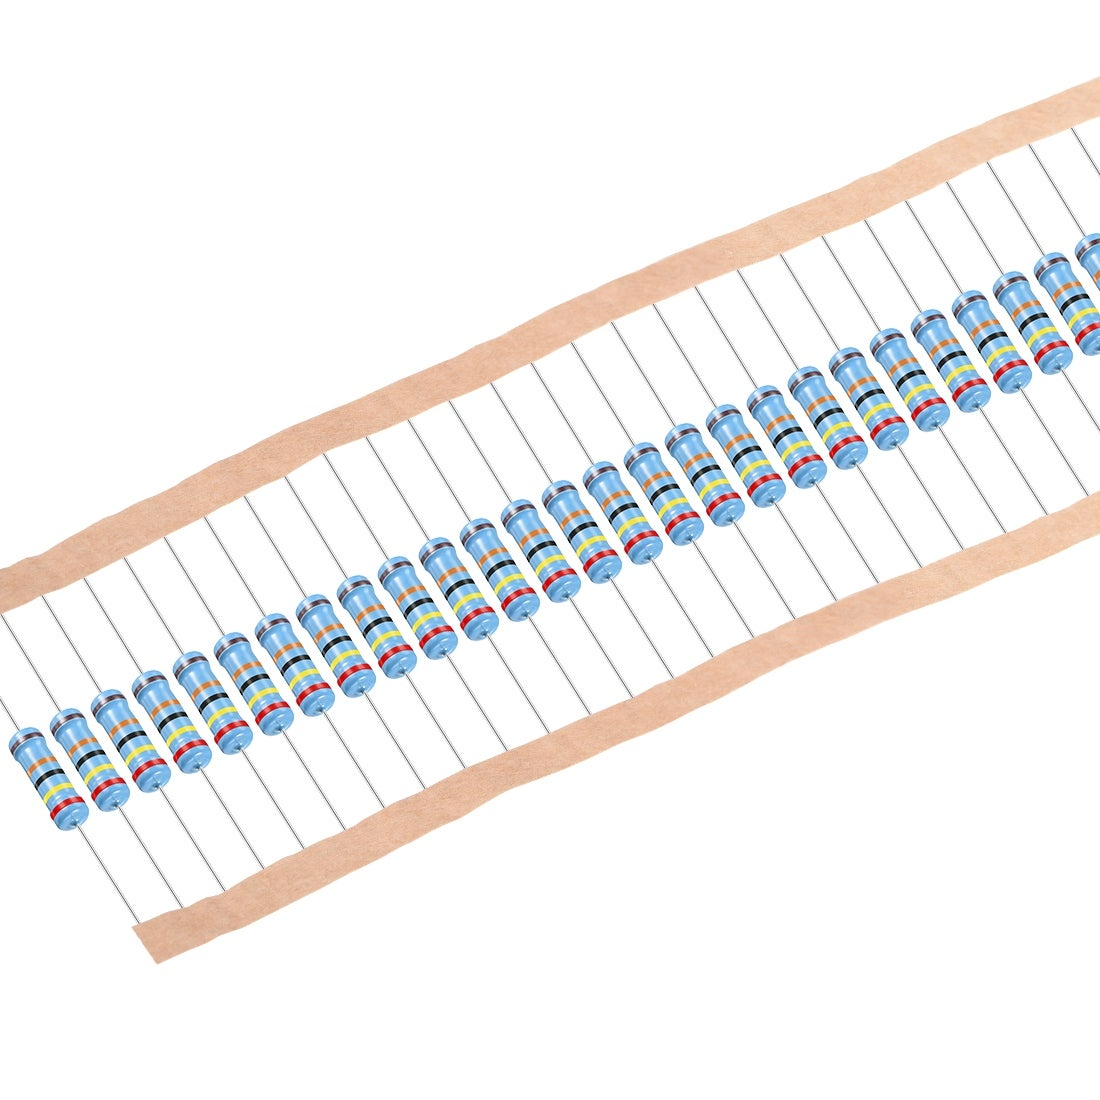 30pcs Metal Film Resistors 240K Ohm 2W 1%Tolerances 5 Color Bands